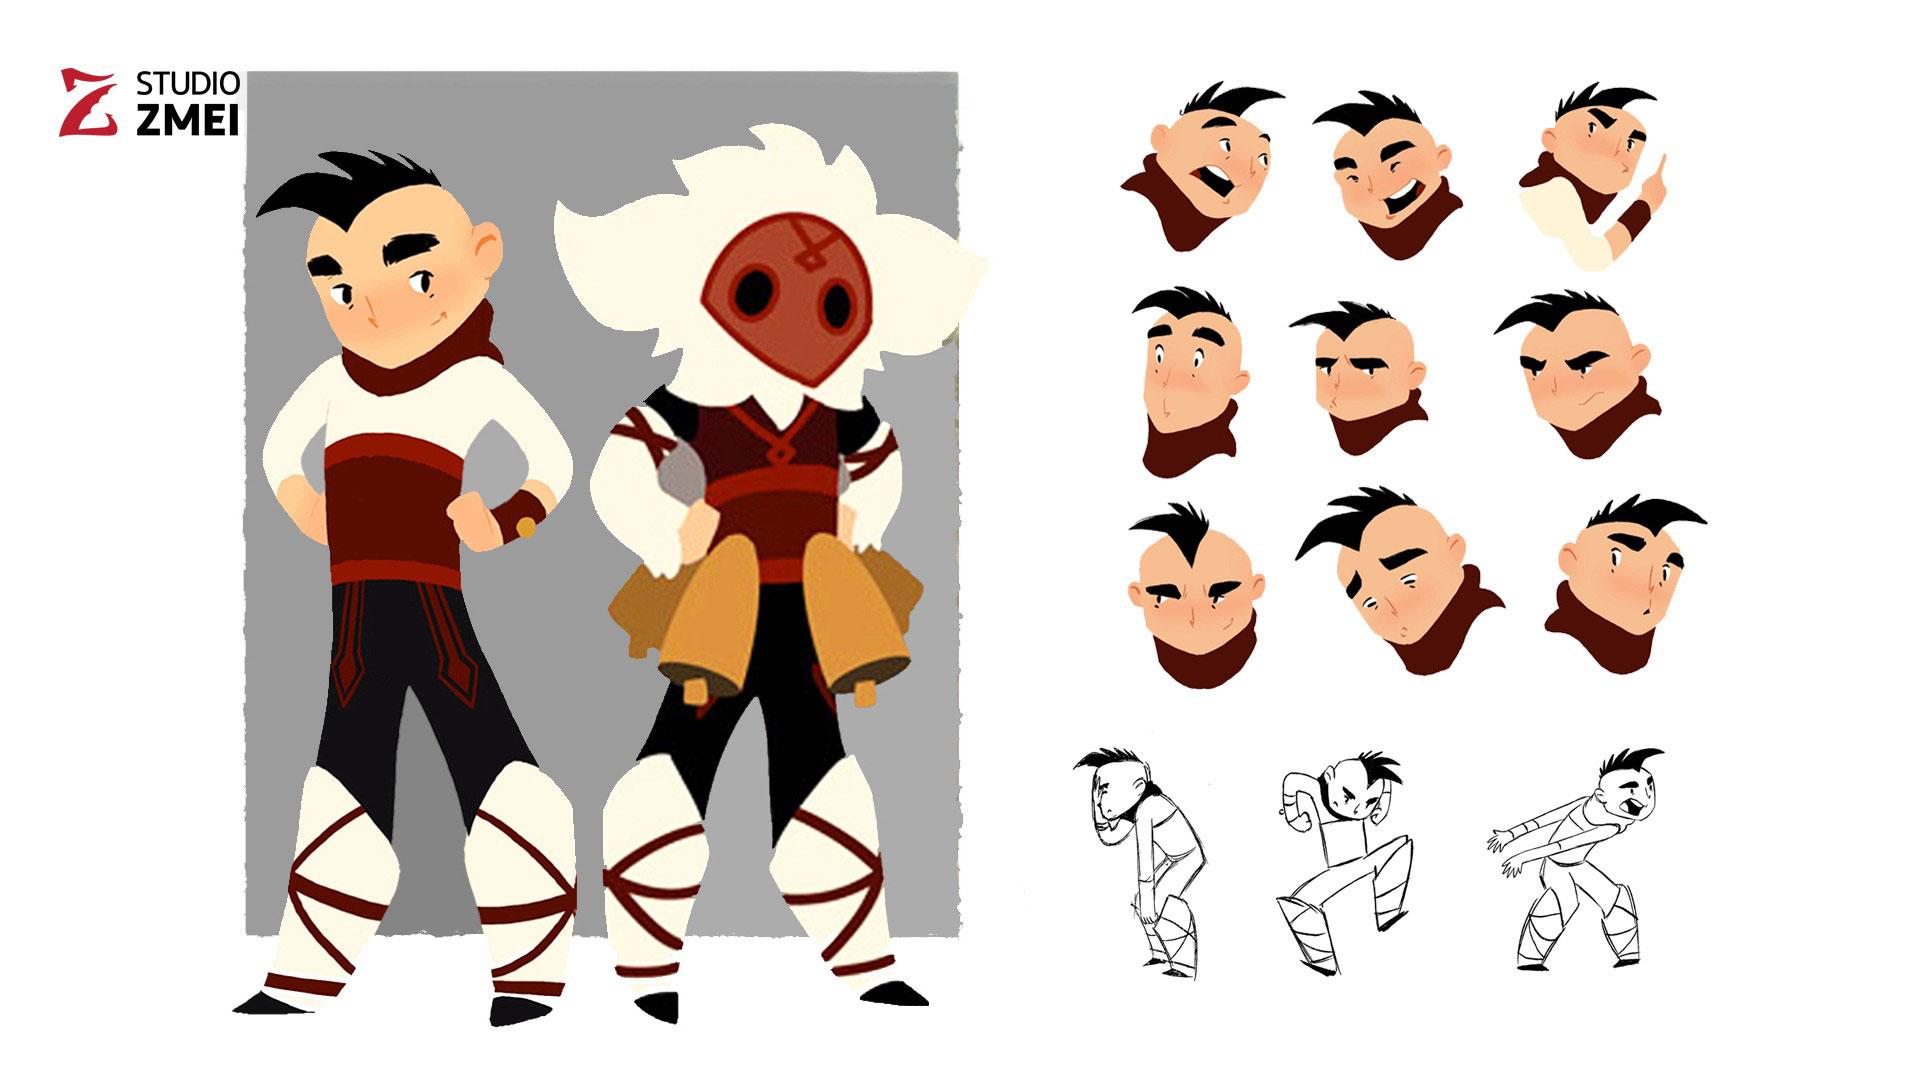 Character Design 05 - The Golden Apple